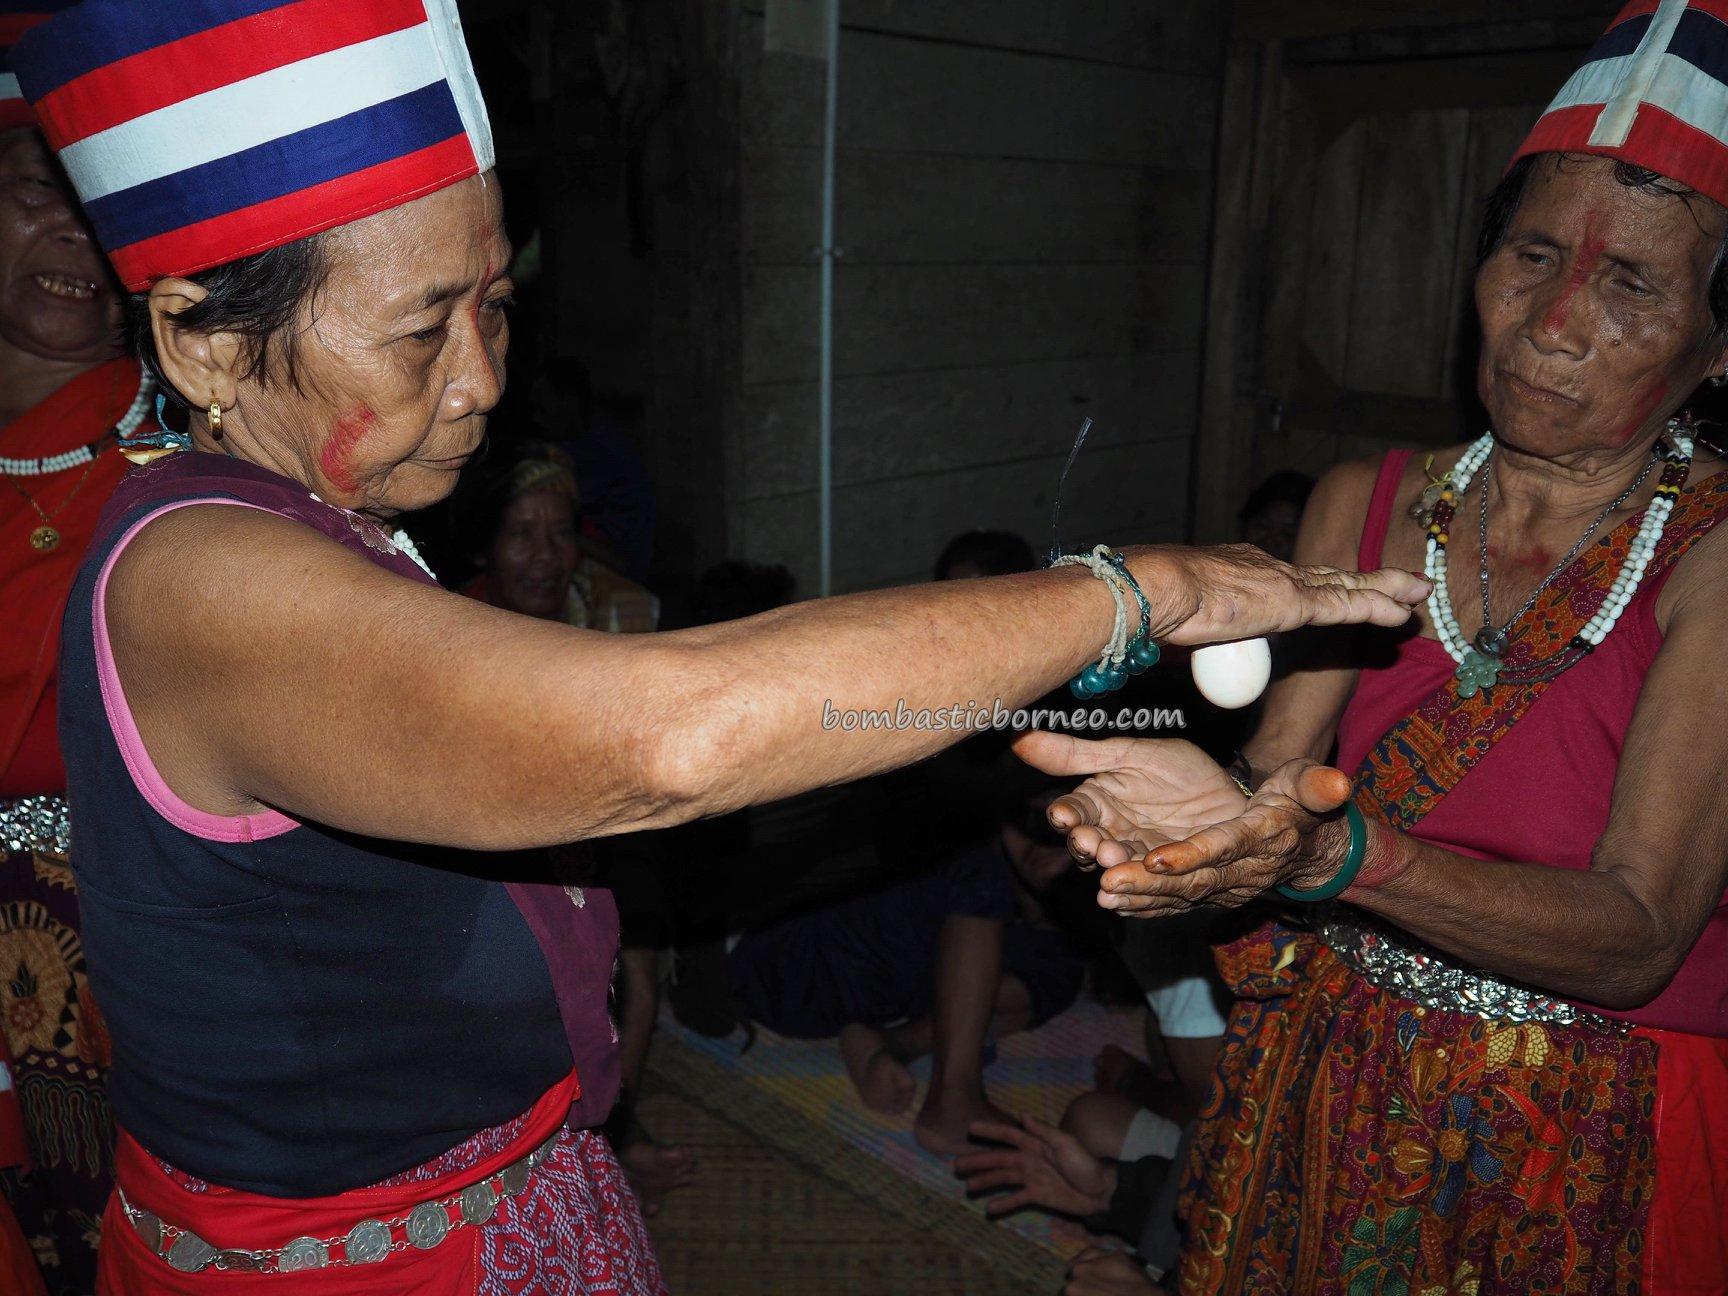 shaman, dukun, ritual, traditional, culture, Indigenous, Dayak Bidayuh, native, tribe, Kuching, Sarawak, Malaysia, Tourism, Travel guide, Borneo